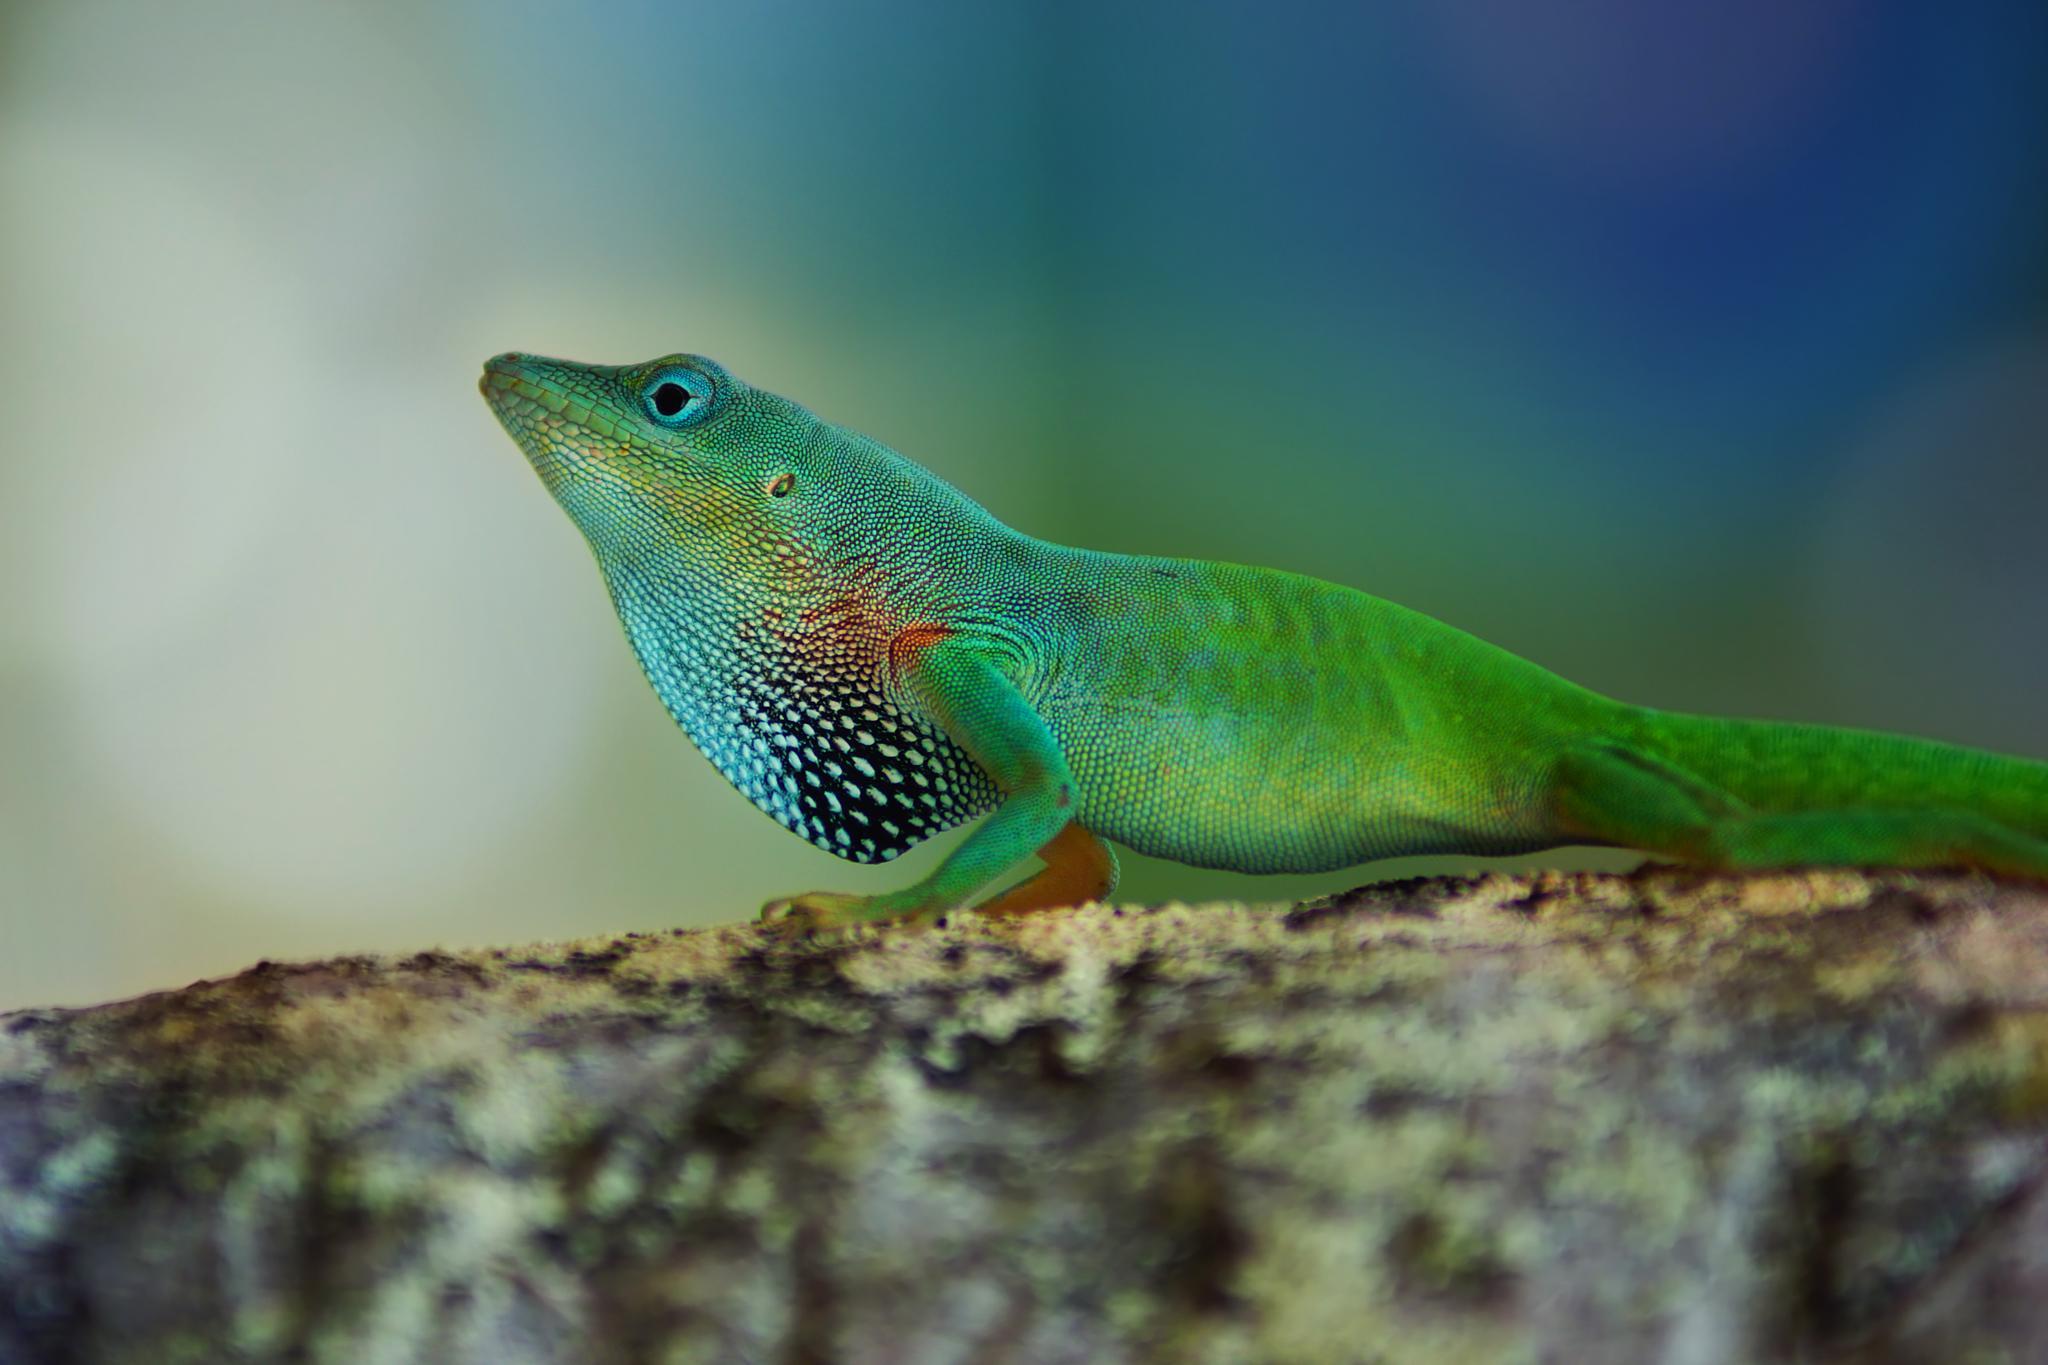 Anolis Lizard by sylviecorriveau